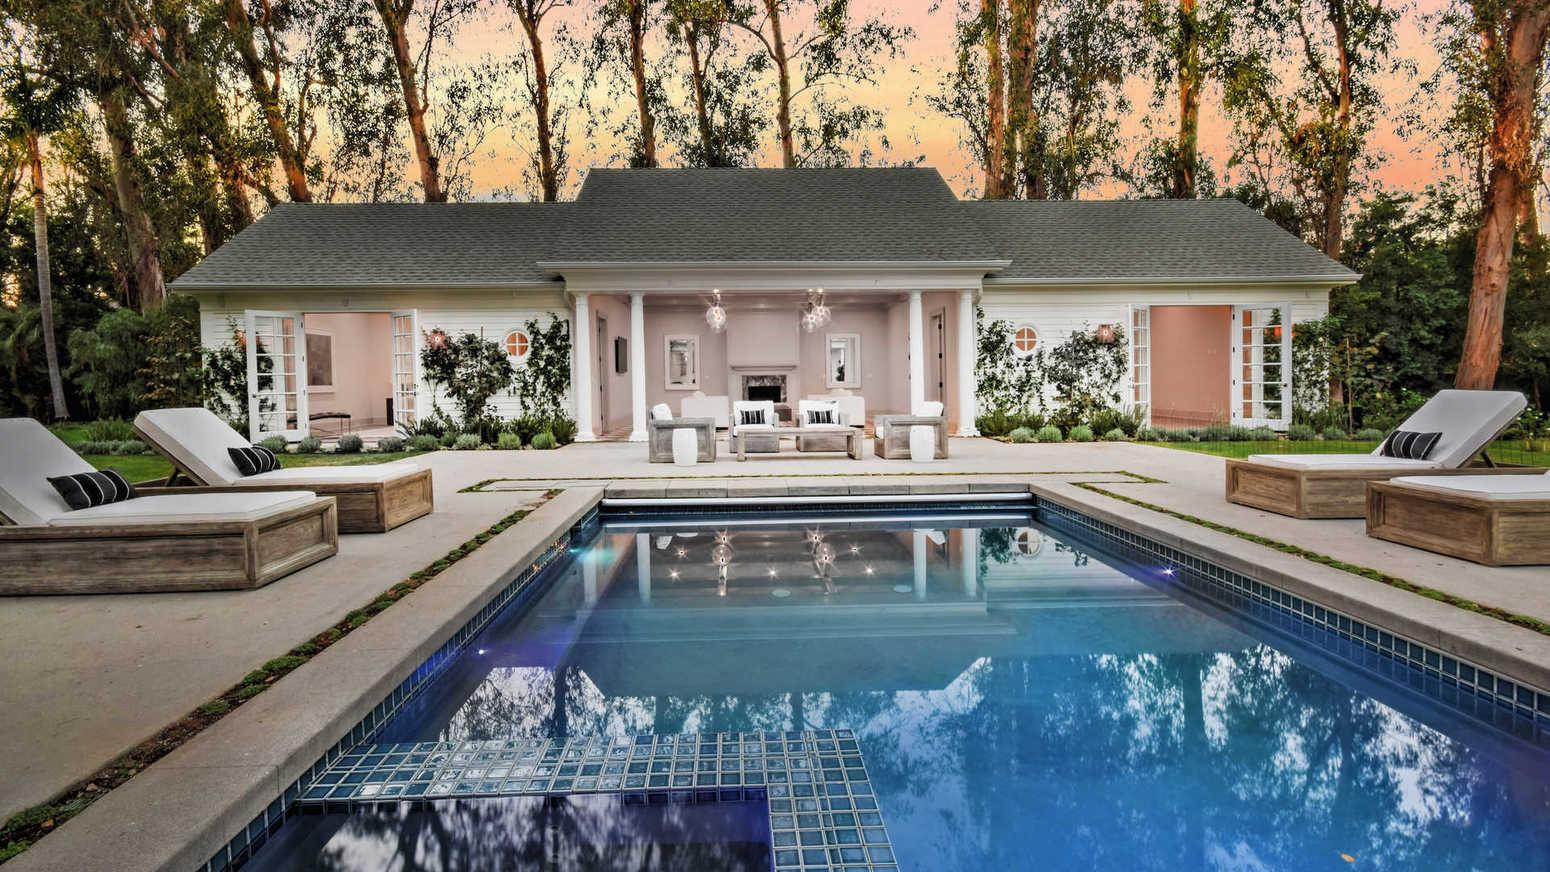 Former Smokey Robinson estate in Encino | Hot Property